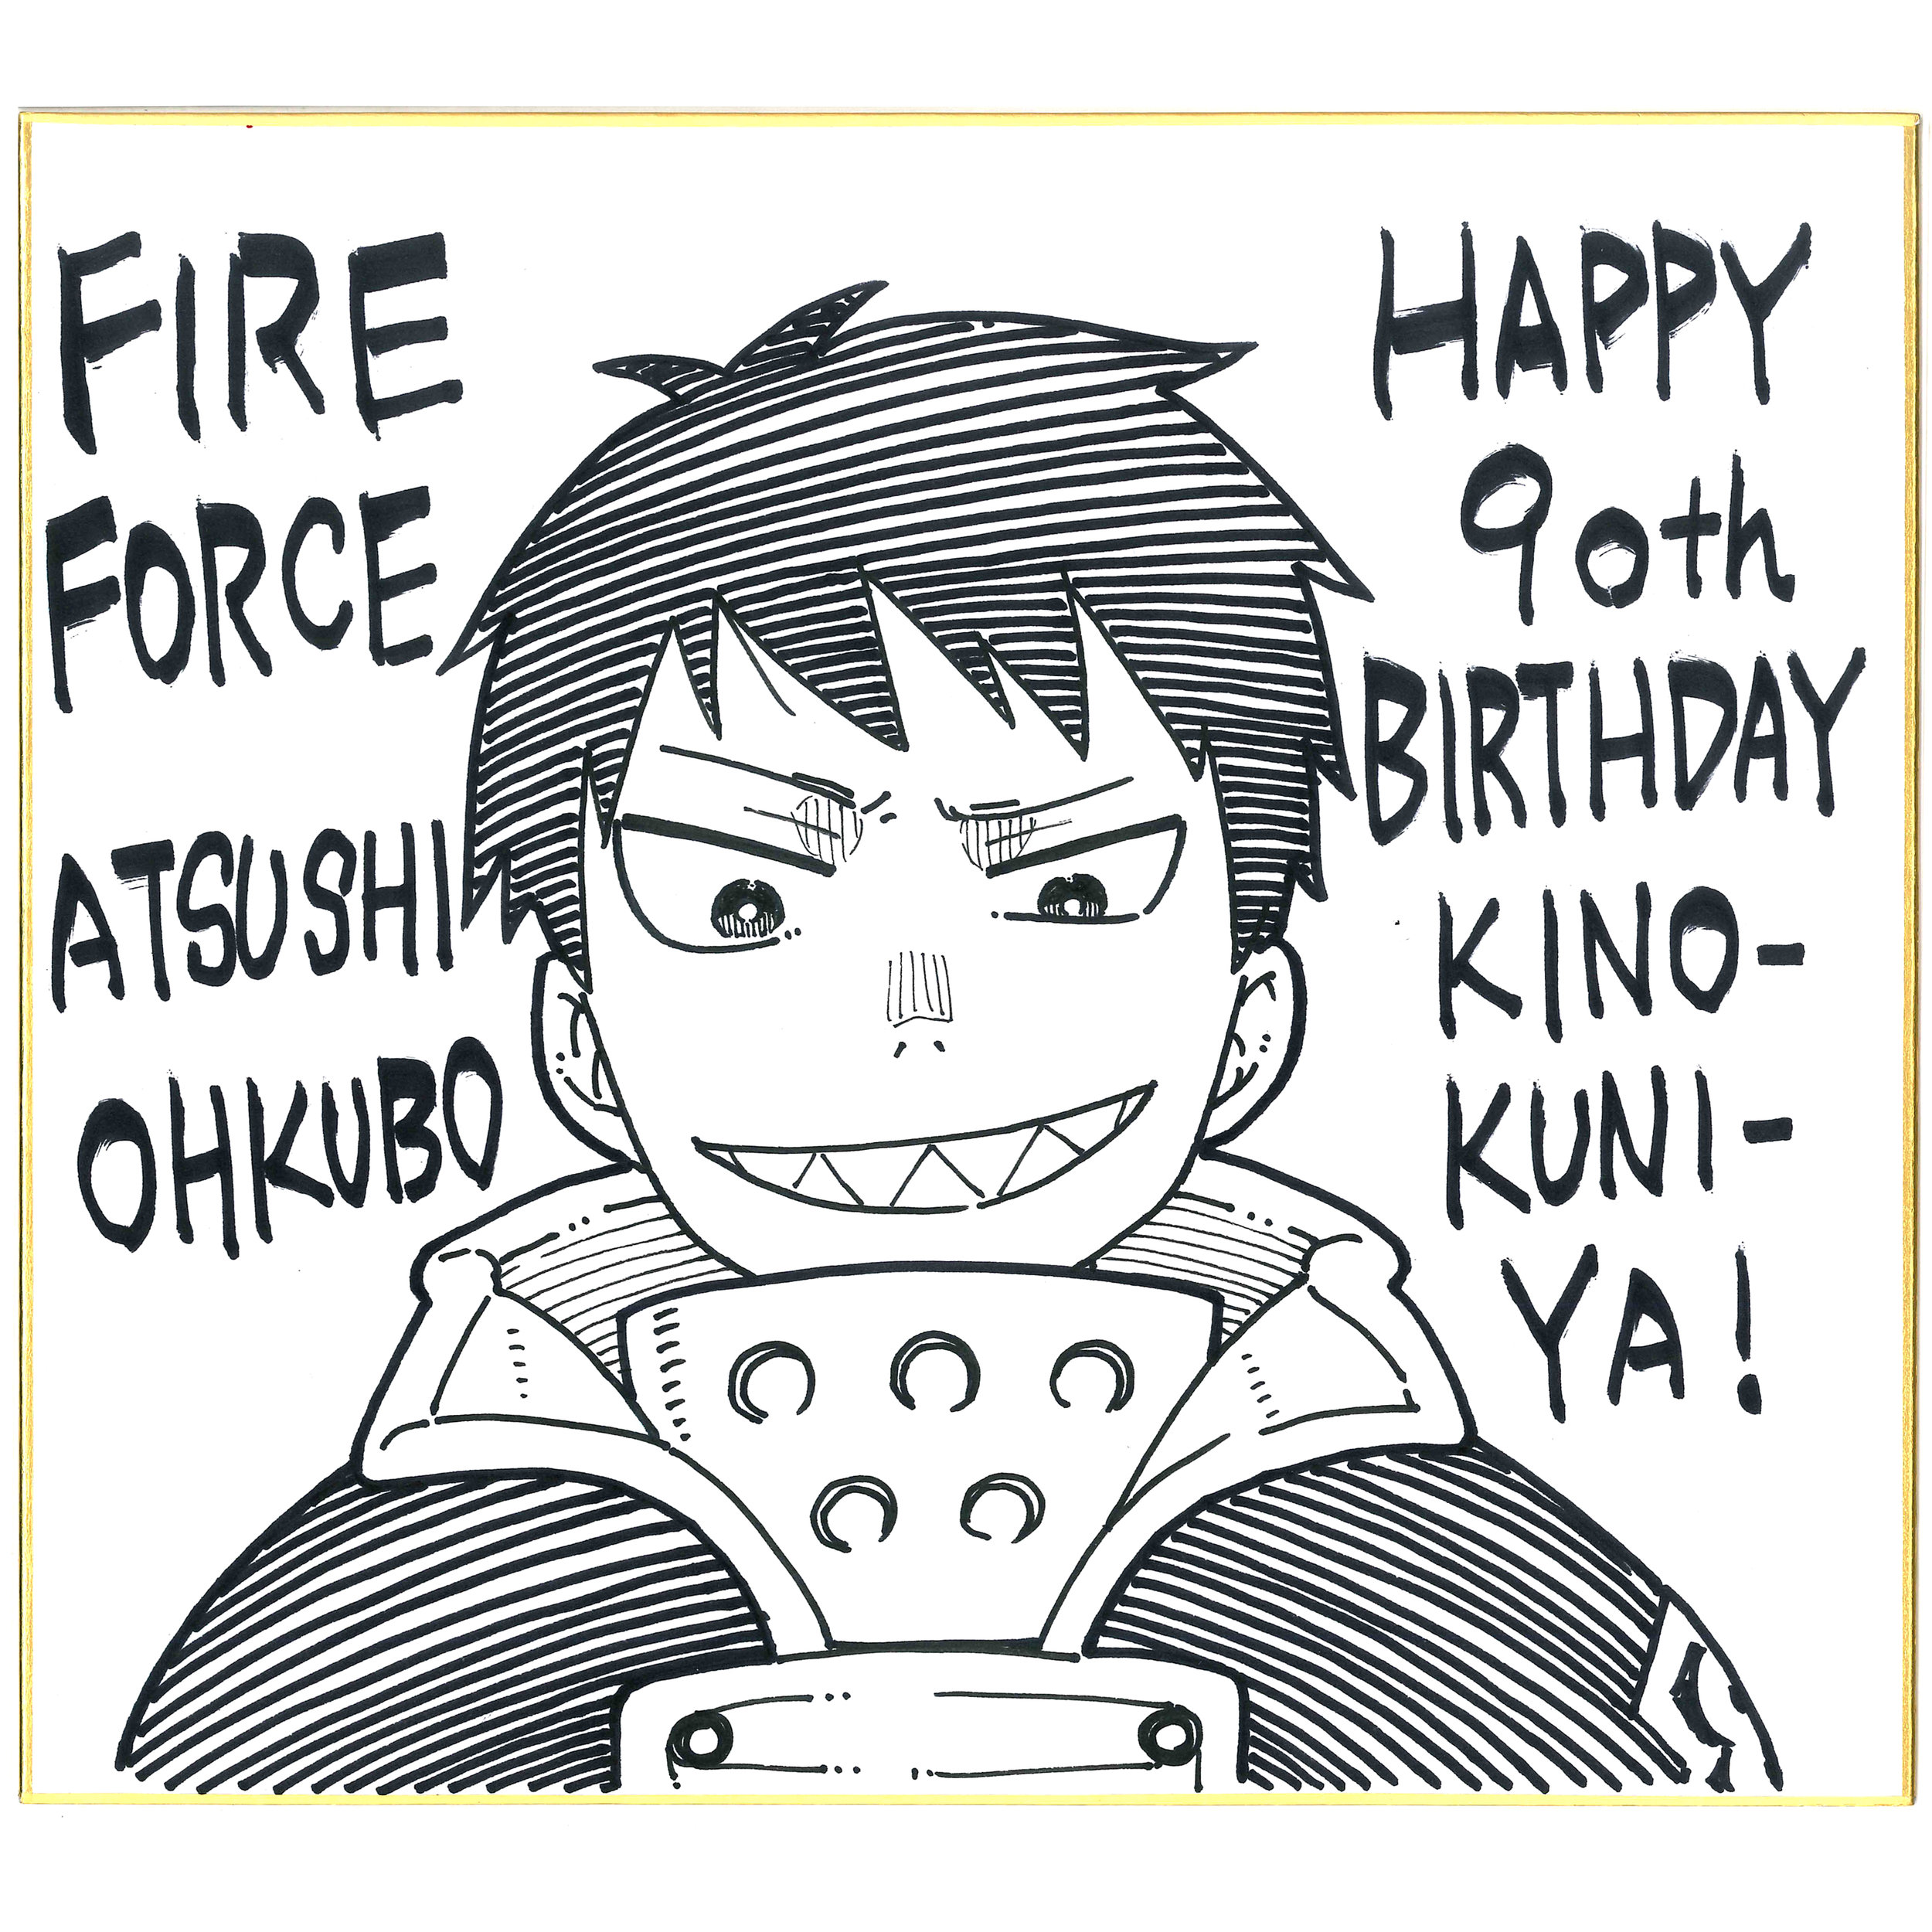 Atsushi Ohkubo:  Fire Force